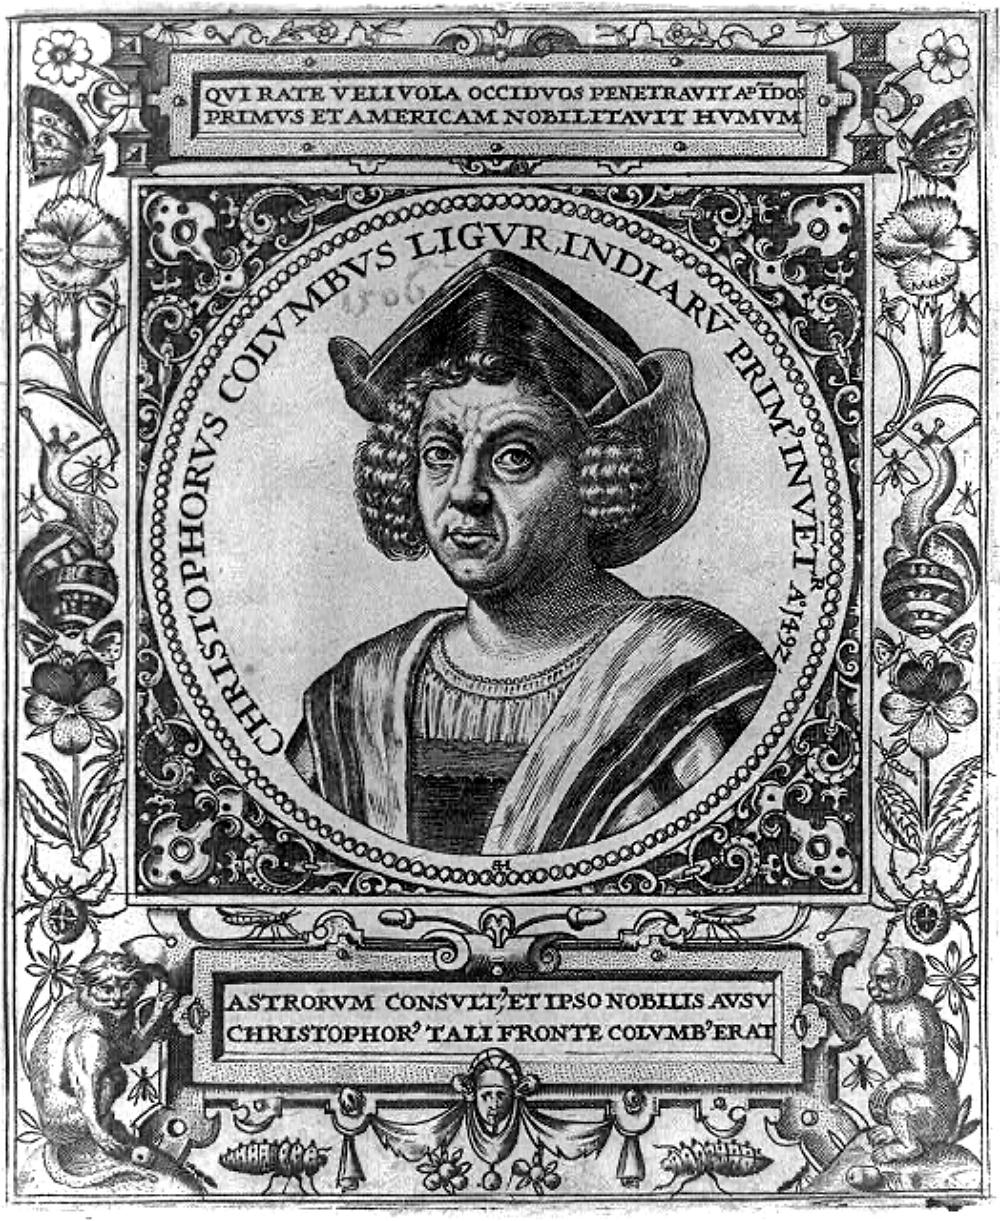 16th century engraving of Christopher Columbus